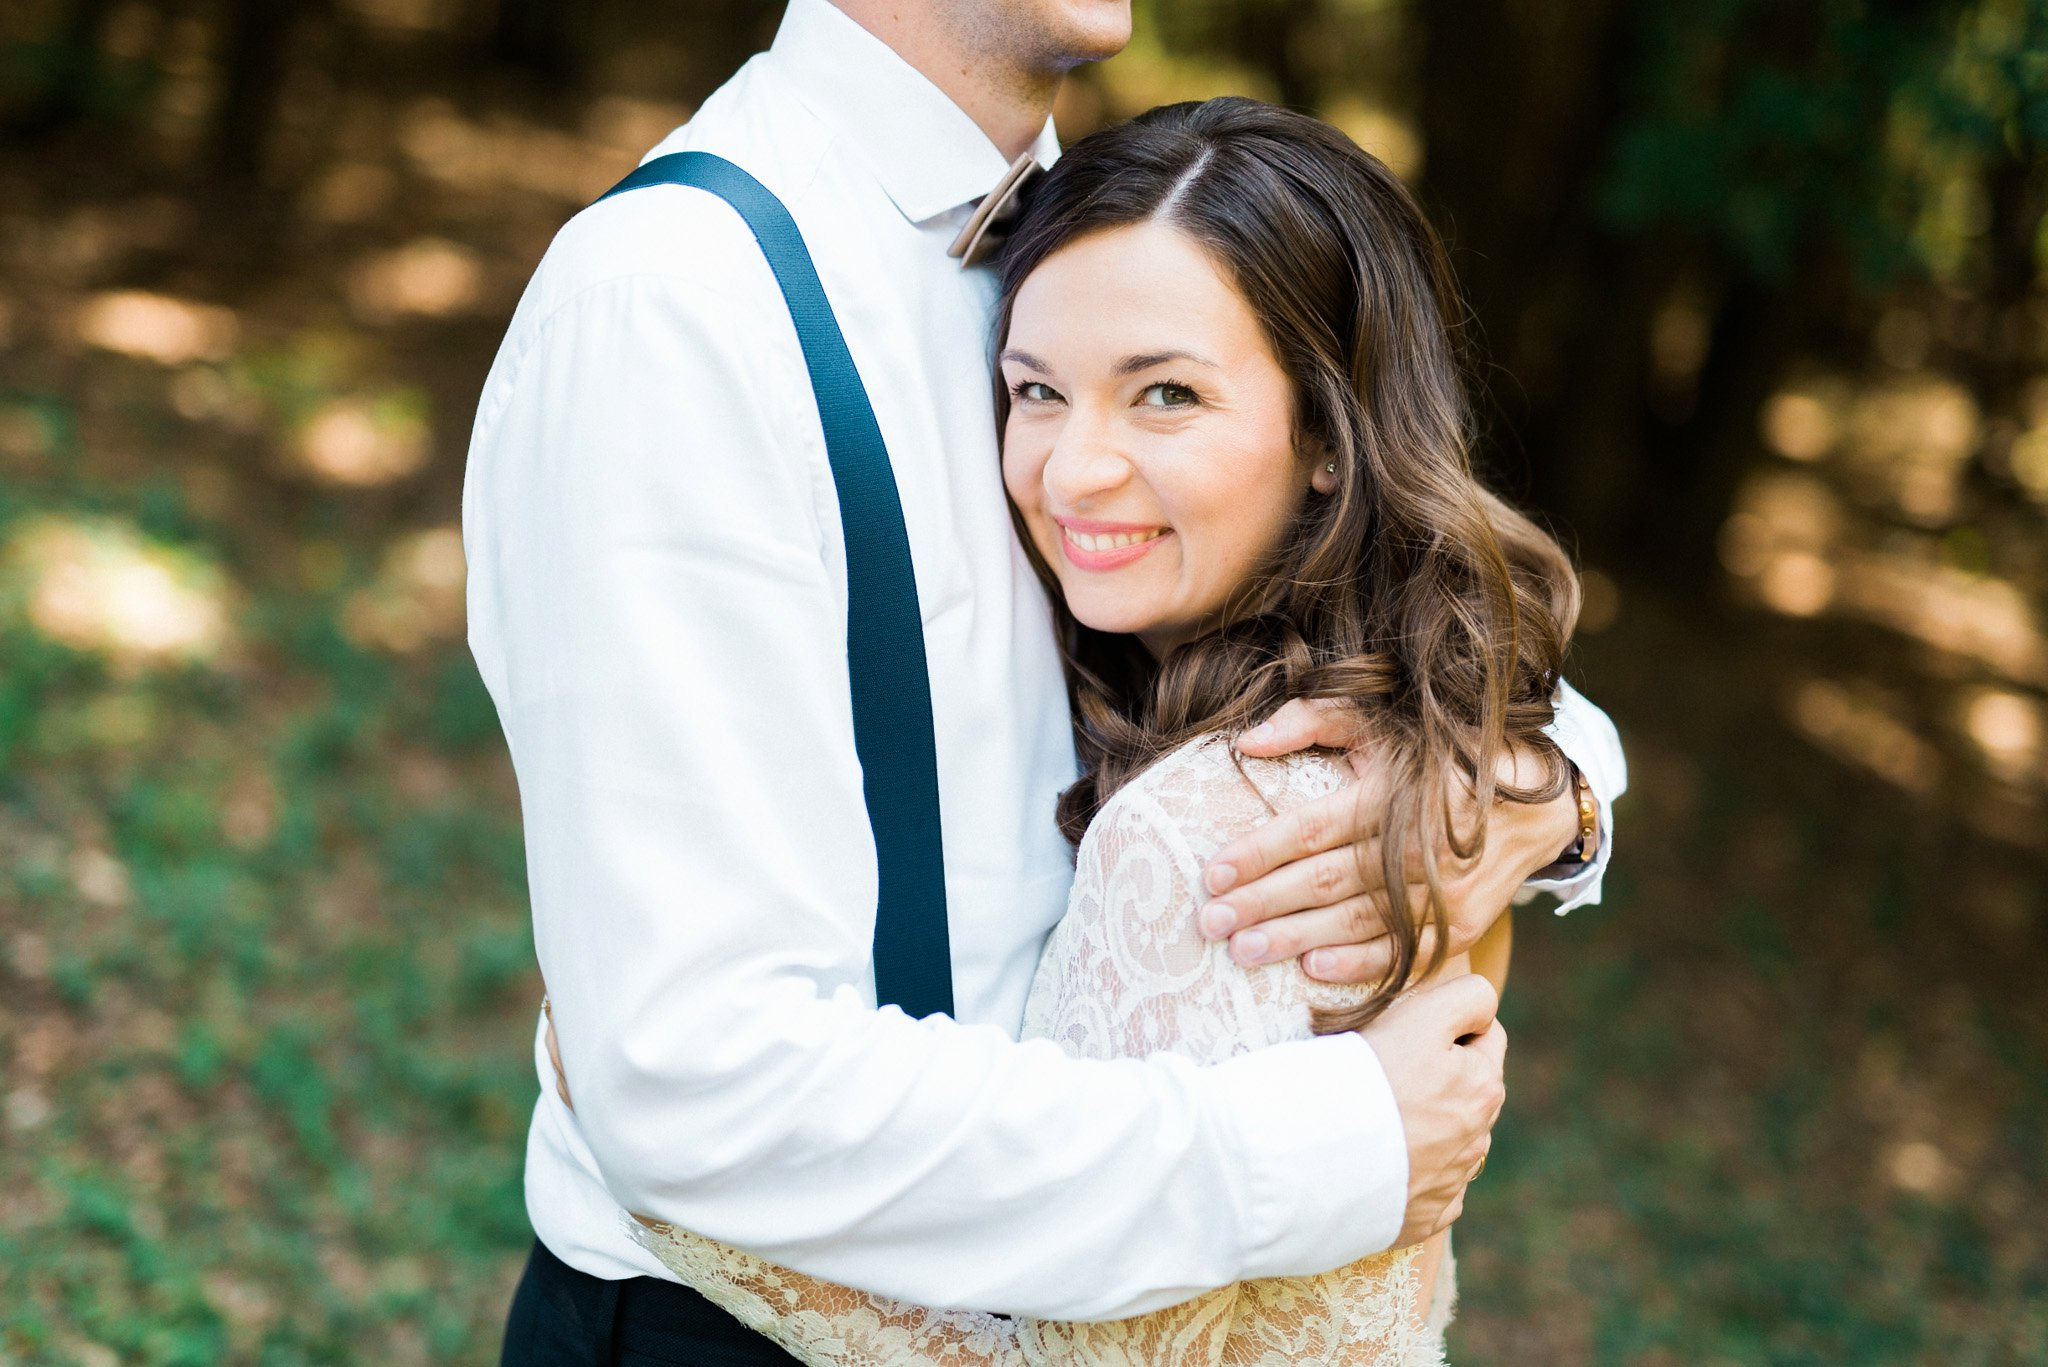 19-cute-couple-hugging-wedding